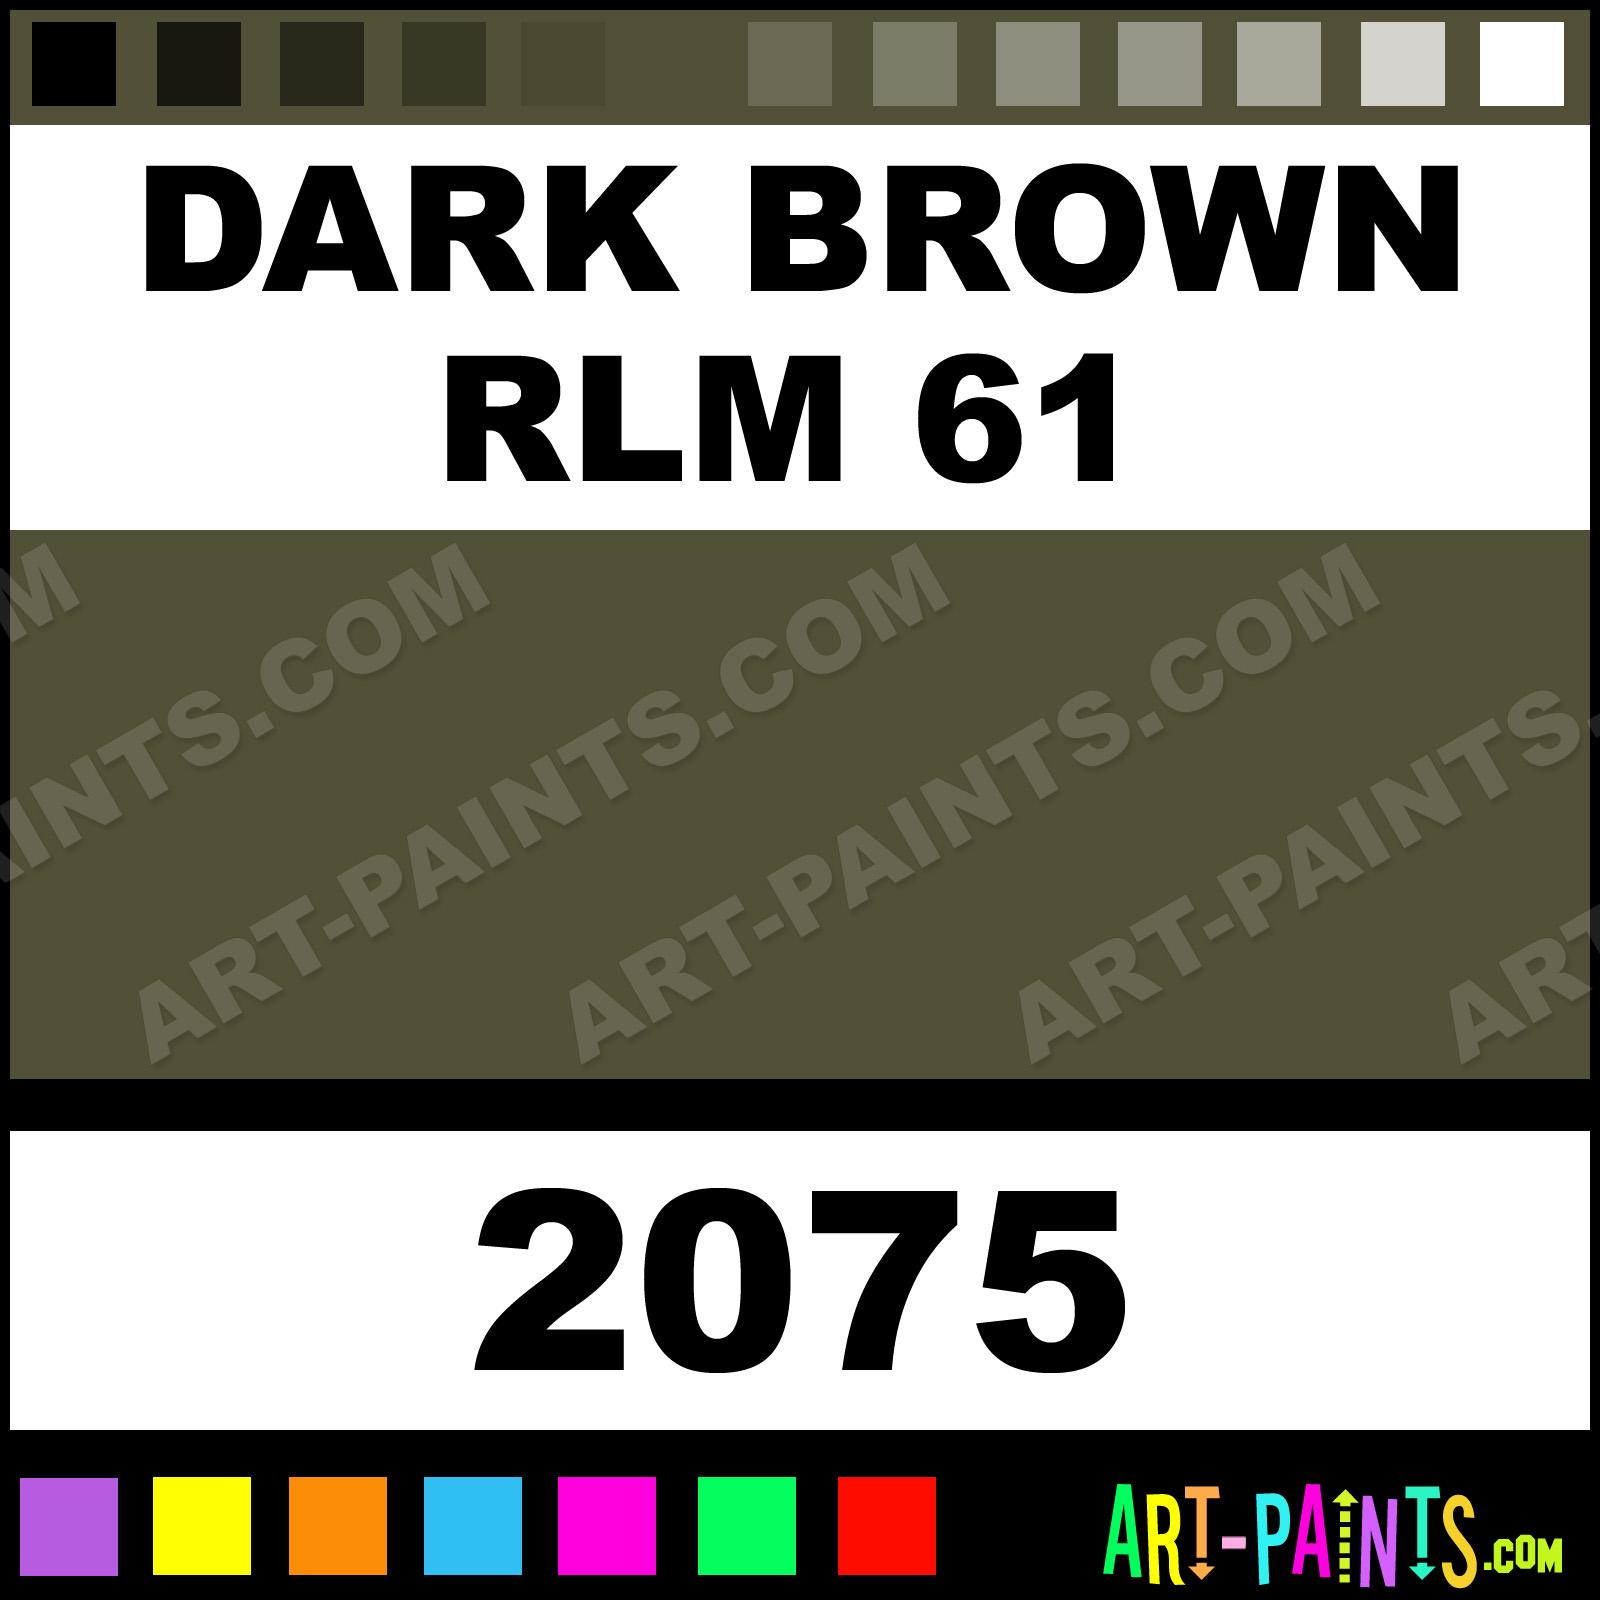 Dark-Brown-RLM-61-xlg.jpg